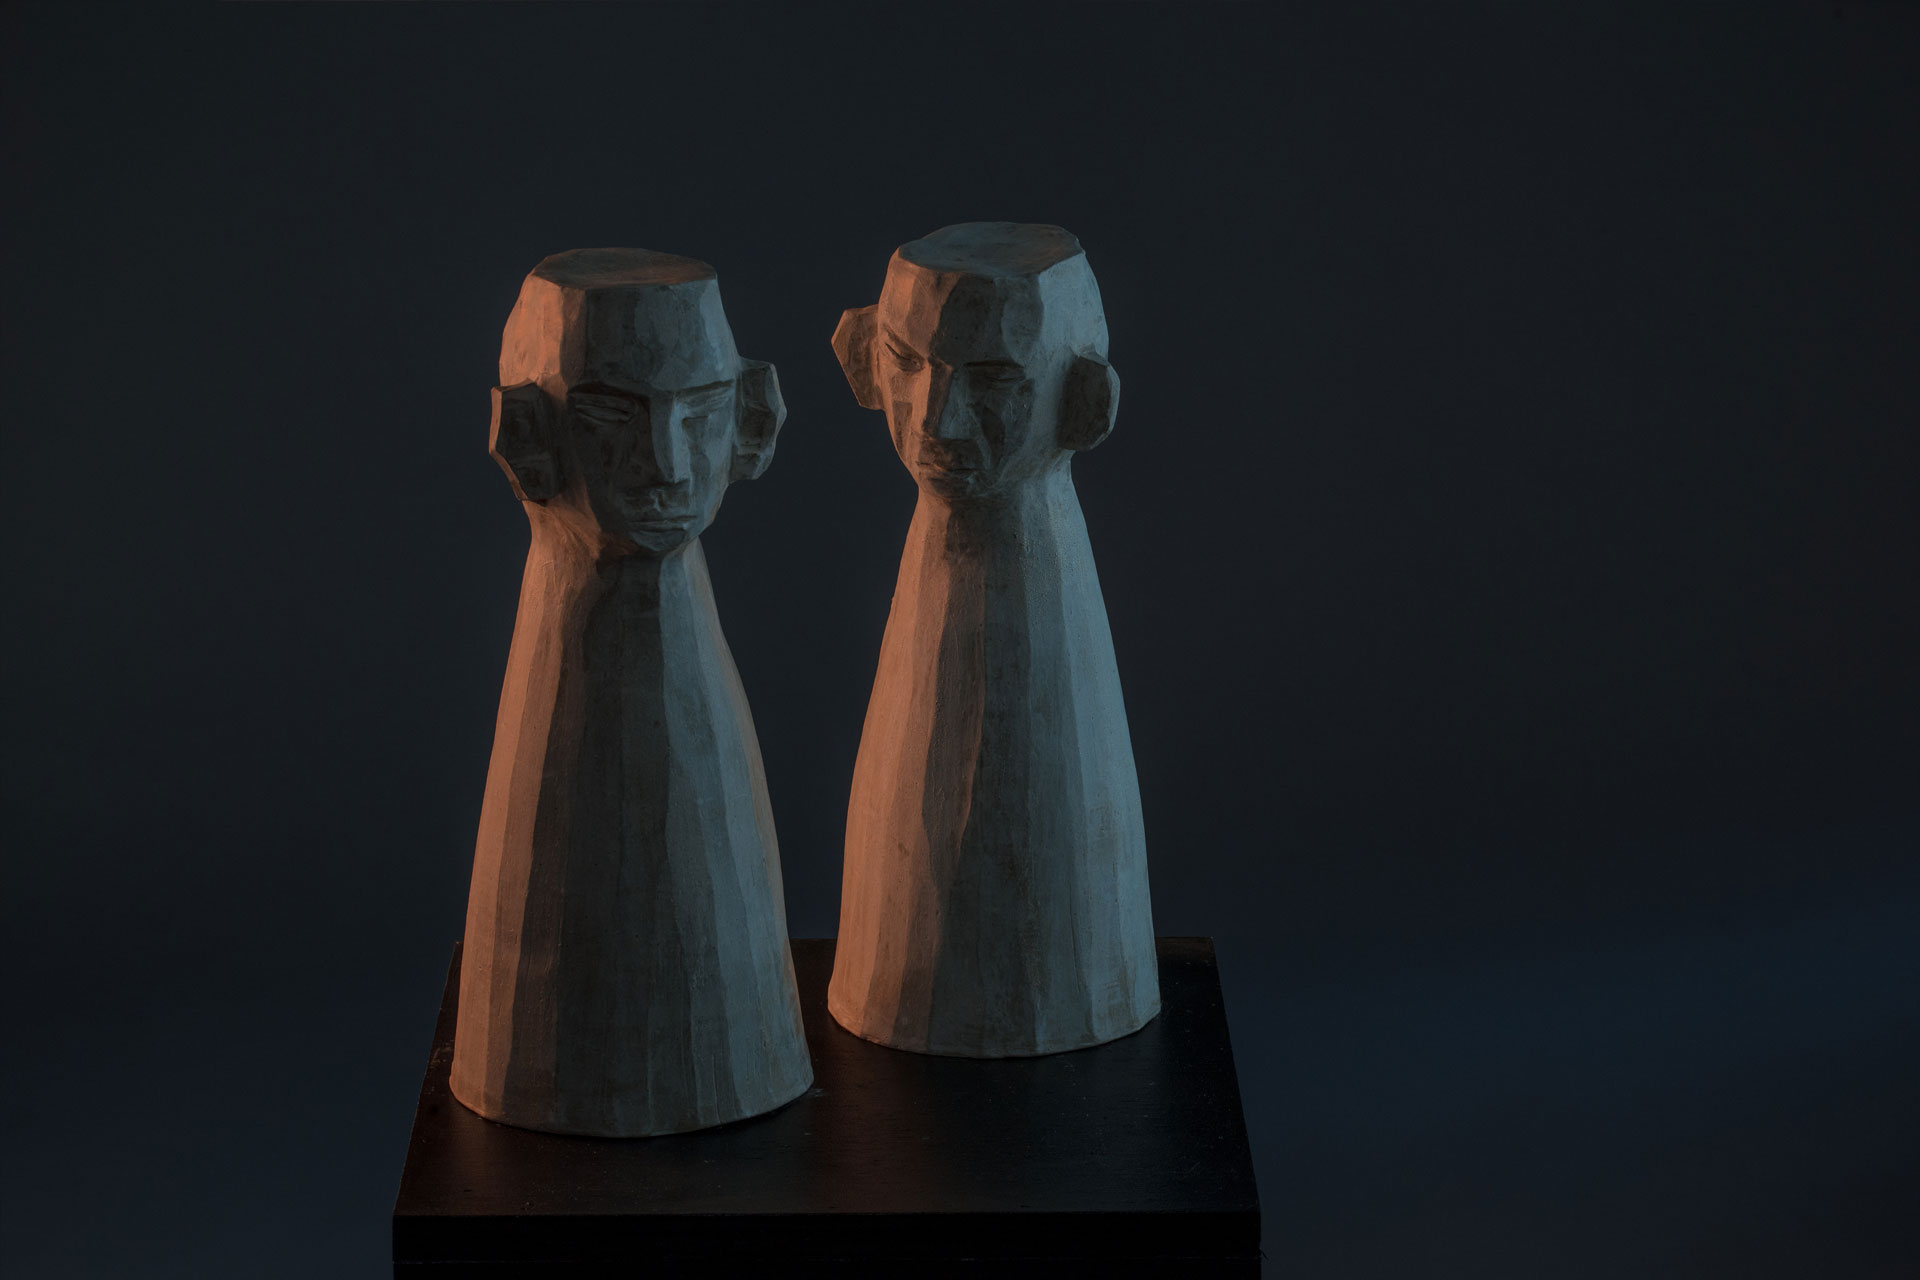 gallery-101-seung-jun-seo-ceramics-artist-asheville-north-carolina-6.jpg